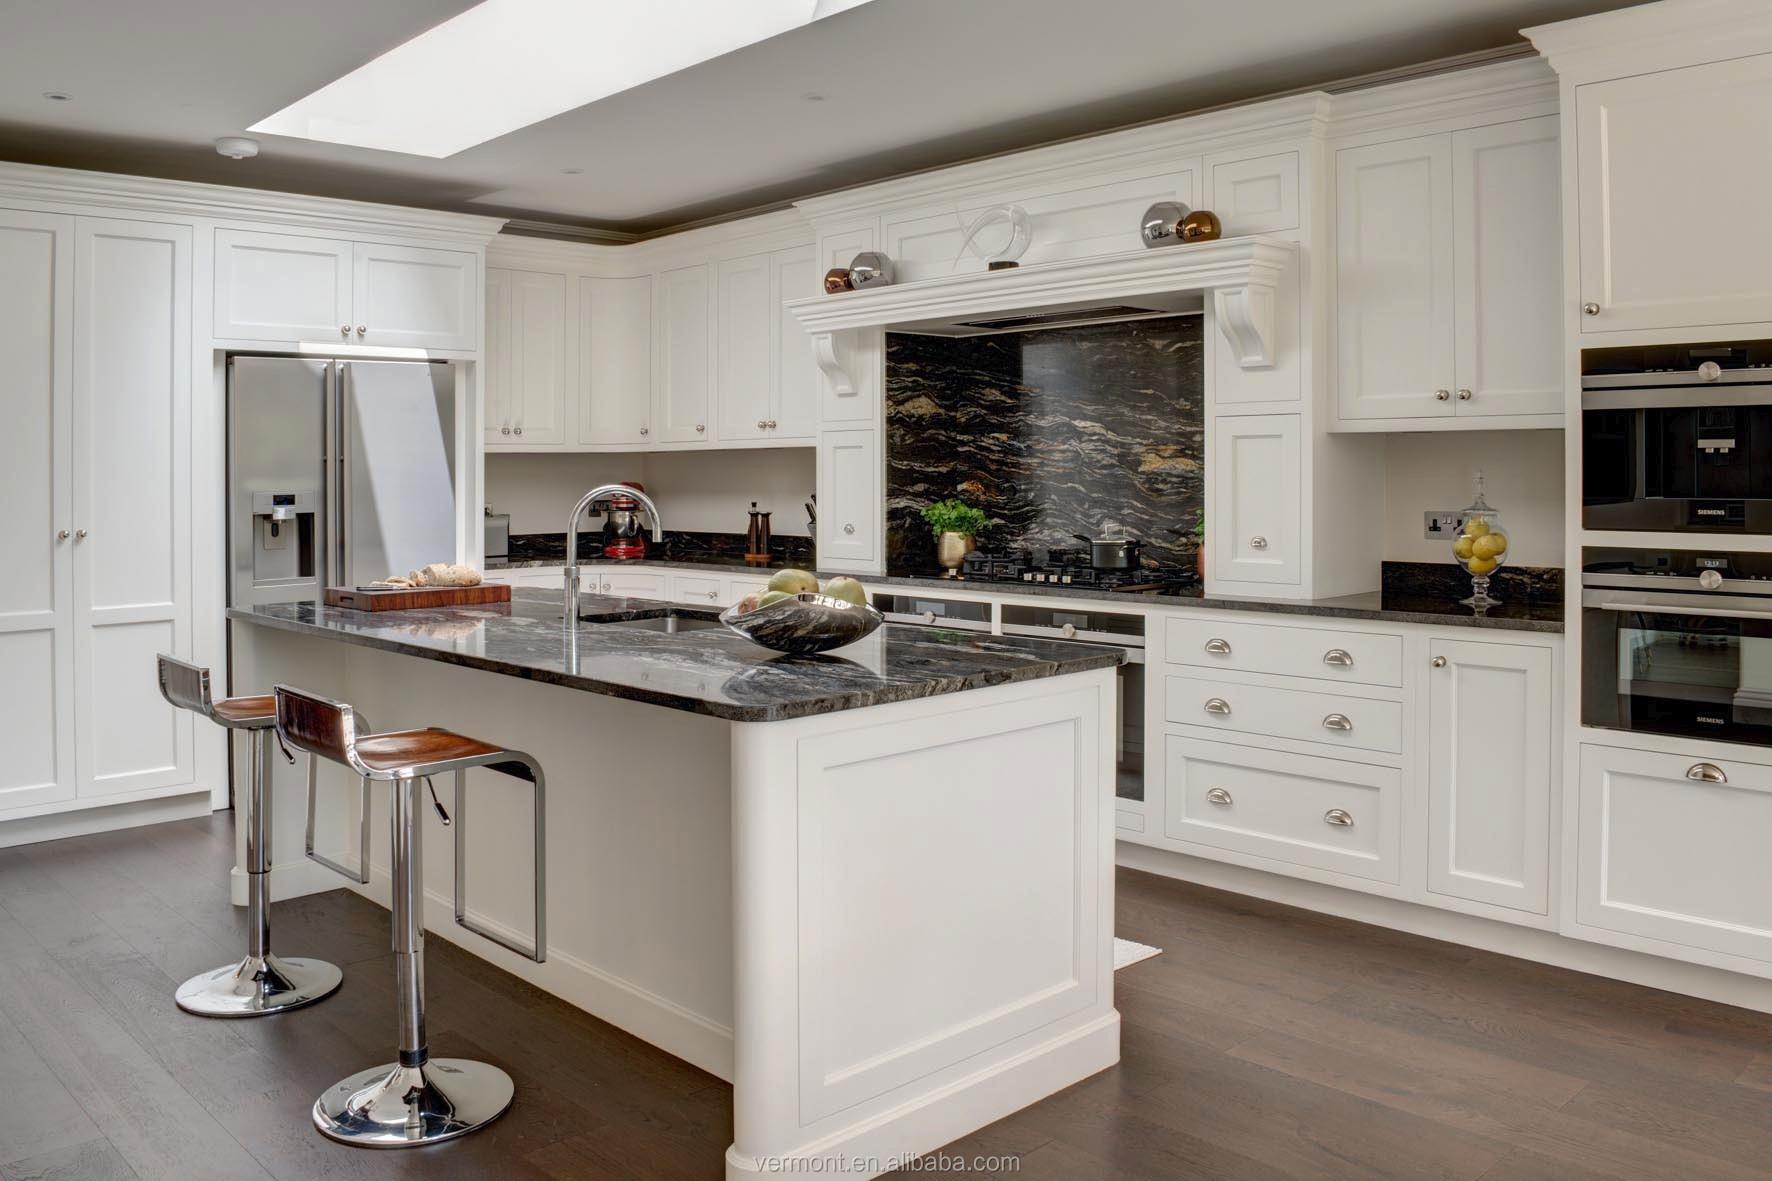 2019 China Customized Australia Black White Blue Plain Shaker Cabinet Design Modular Kitchen Buy Kitchen Cabinet Modern Kitchen Cabinet Kitchen